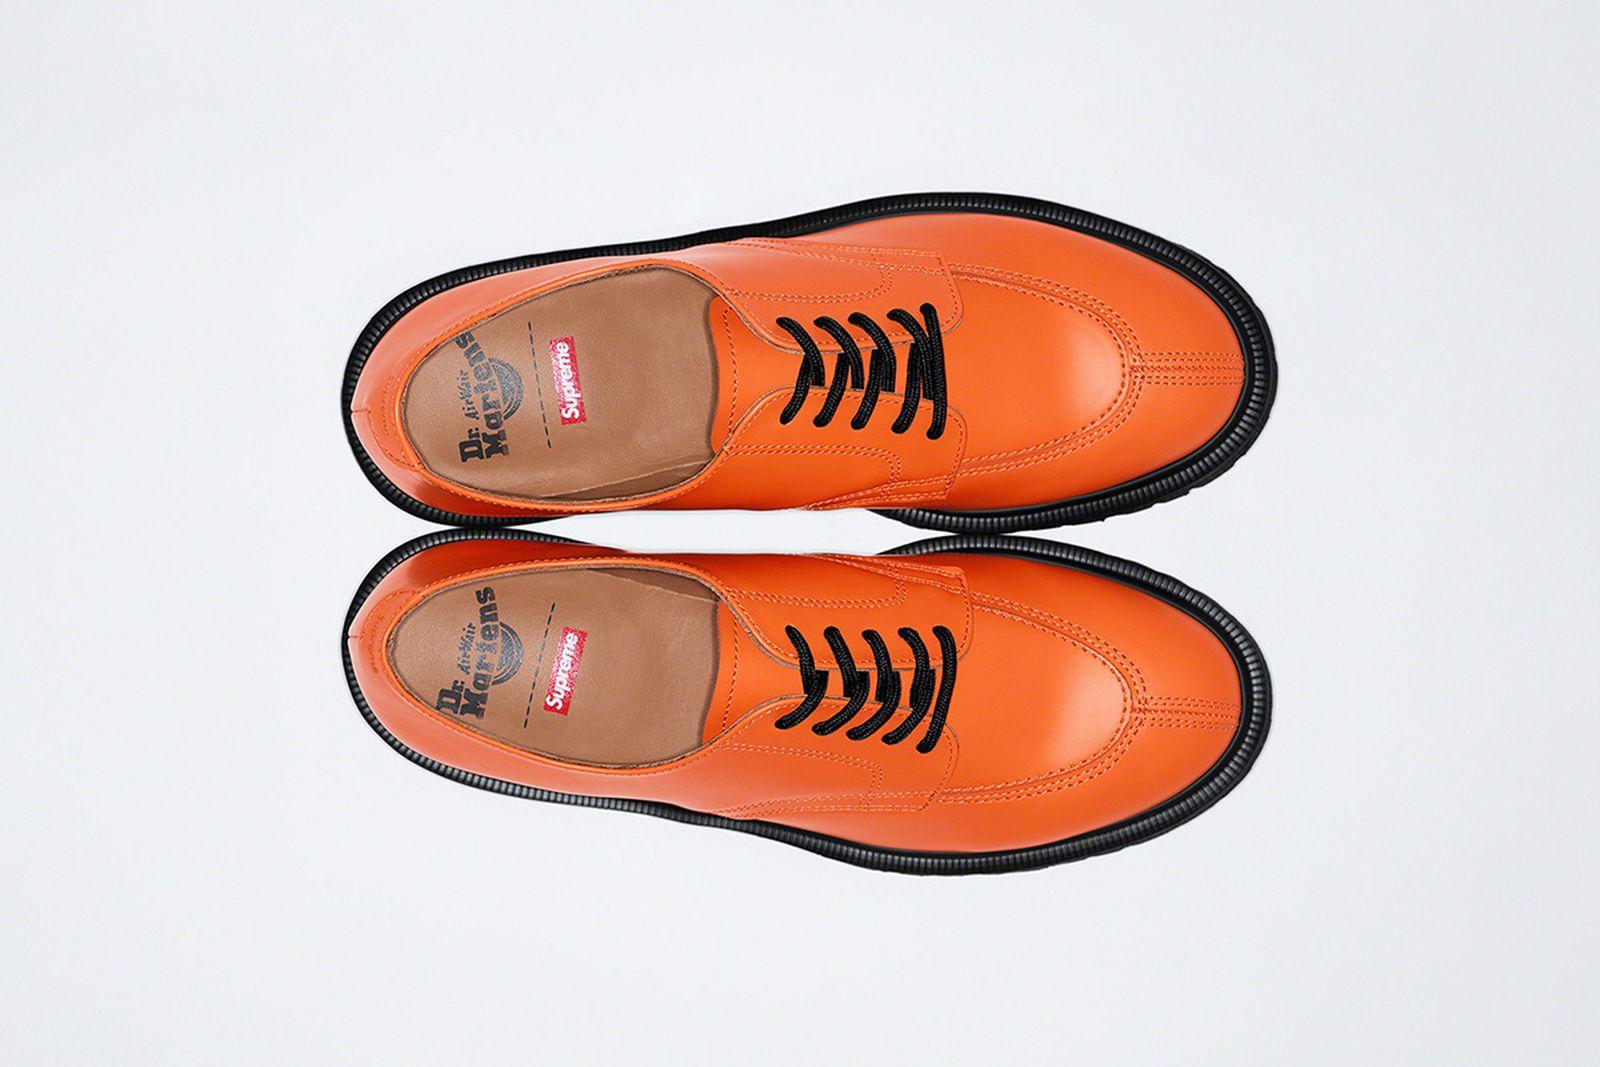 supreme-dr-martens-5-eye-shoe-release-date-price-06